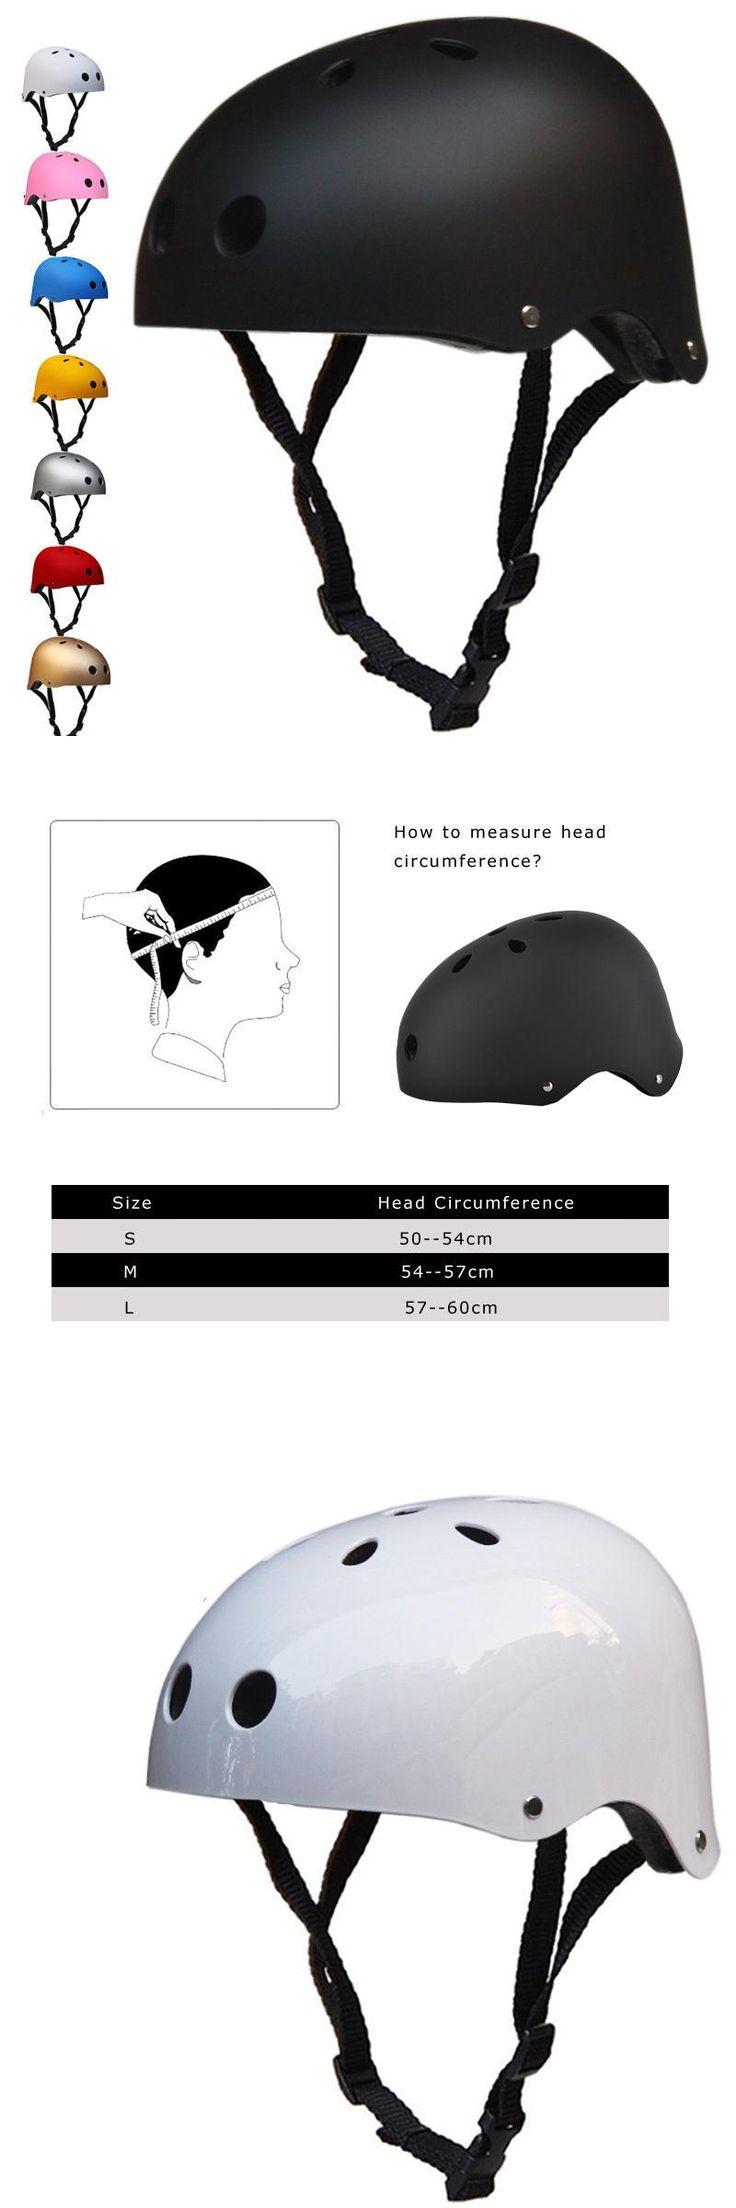 [Visit to Buy] Skate BMX Scooter Stunt Bike Bicycle Cycling Crash Safety Helmet Skateboard SML #Advertisement